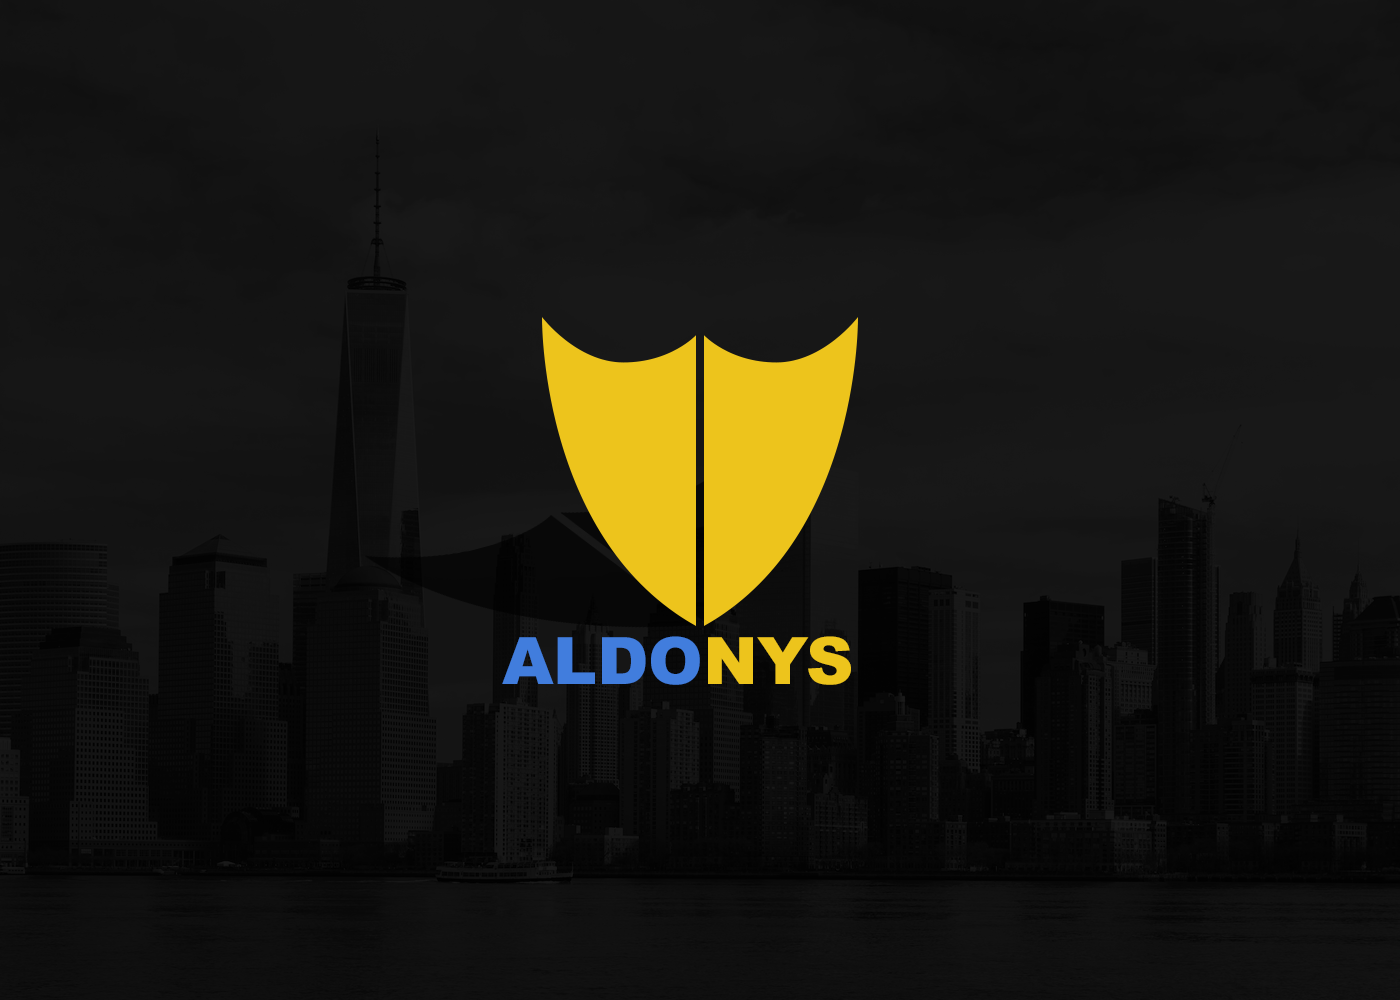 ALDONYS